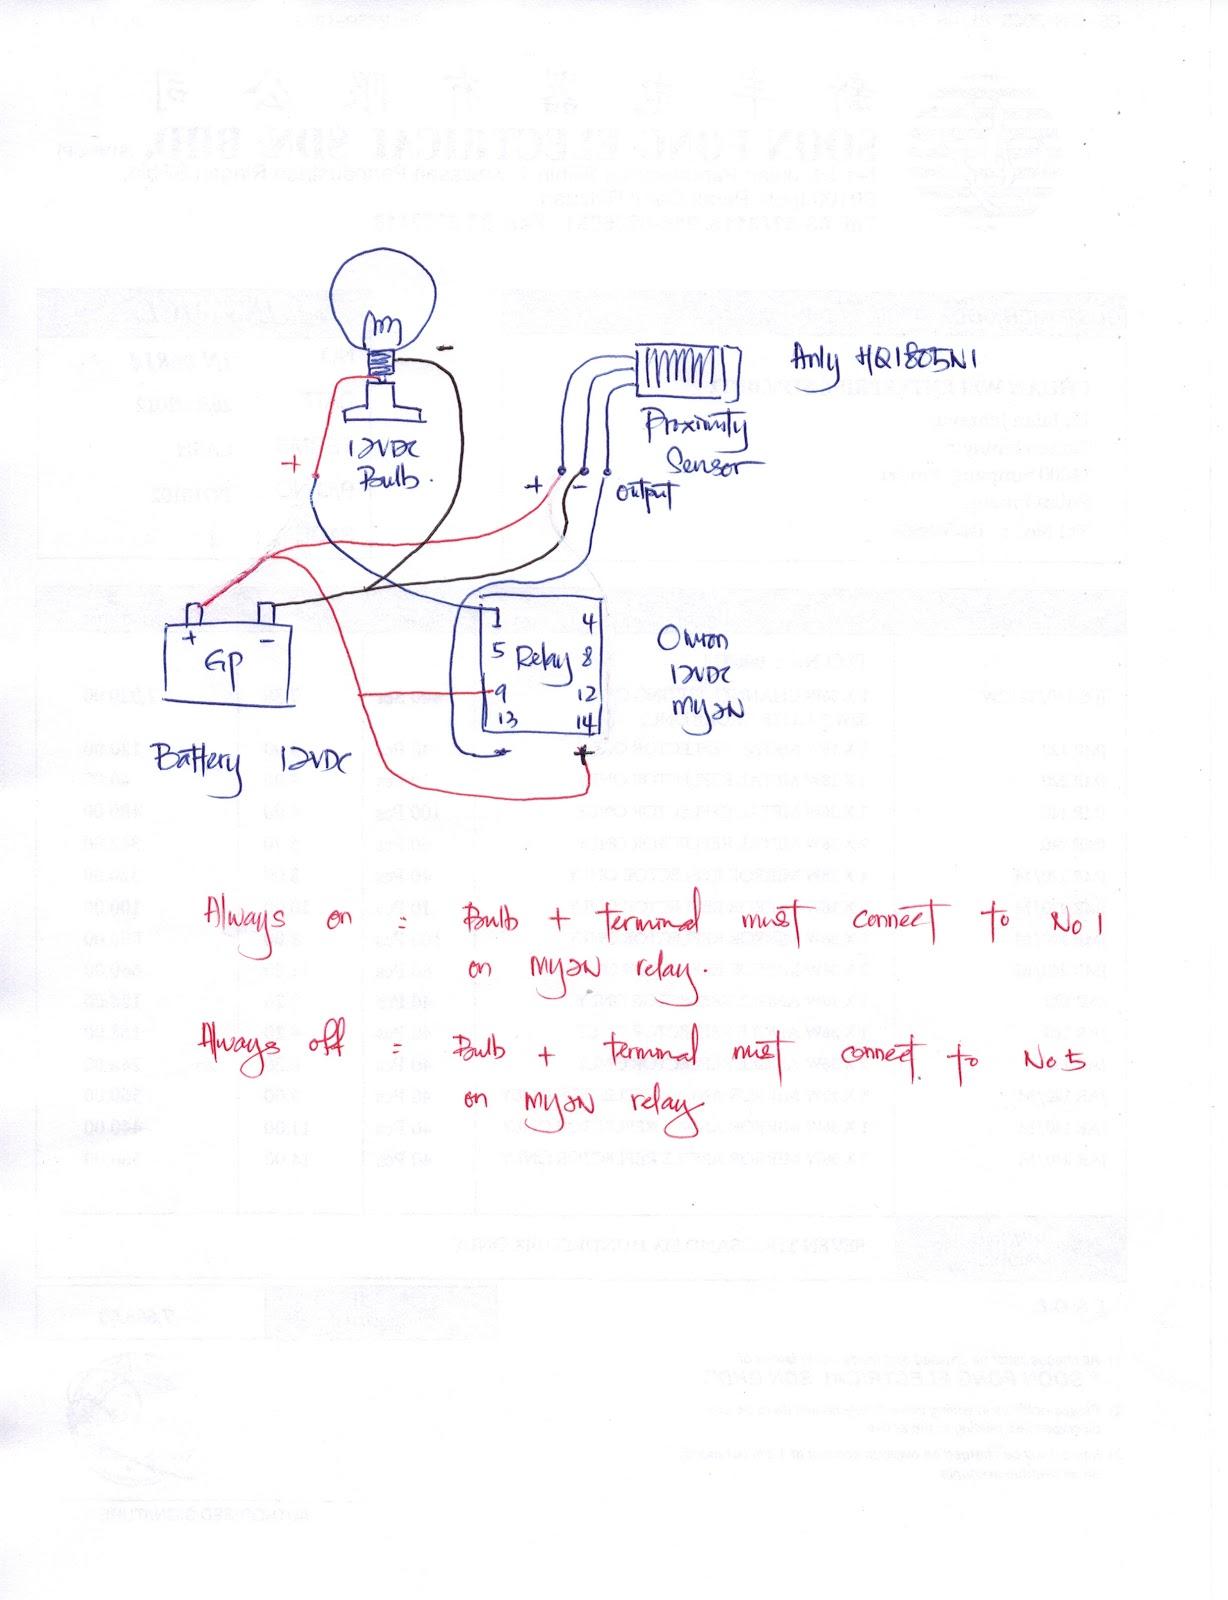 12VDC Tornado Bulb x 1unit. Omron MY2N 12VDC Relay c/with Base x 1unit.  Anly HQ-1805N1 10-30VDC Proximity Sensor x 1unit. Loose wire - 1/2meter